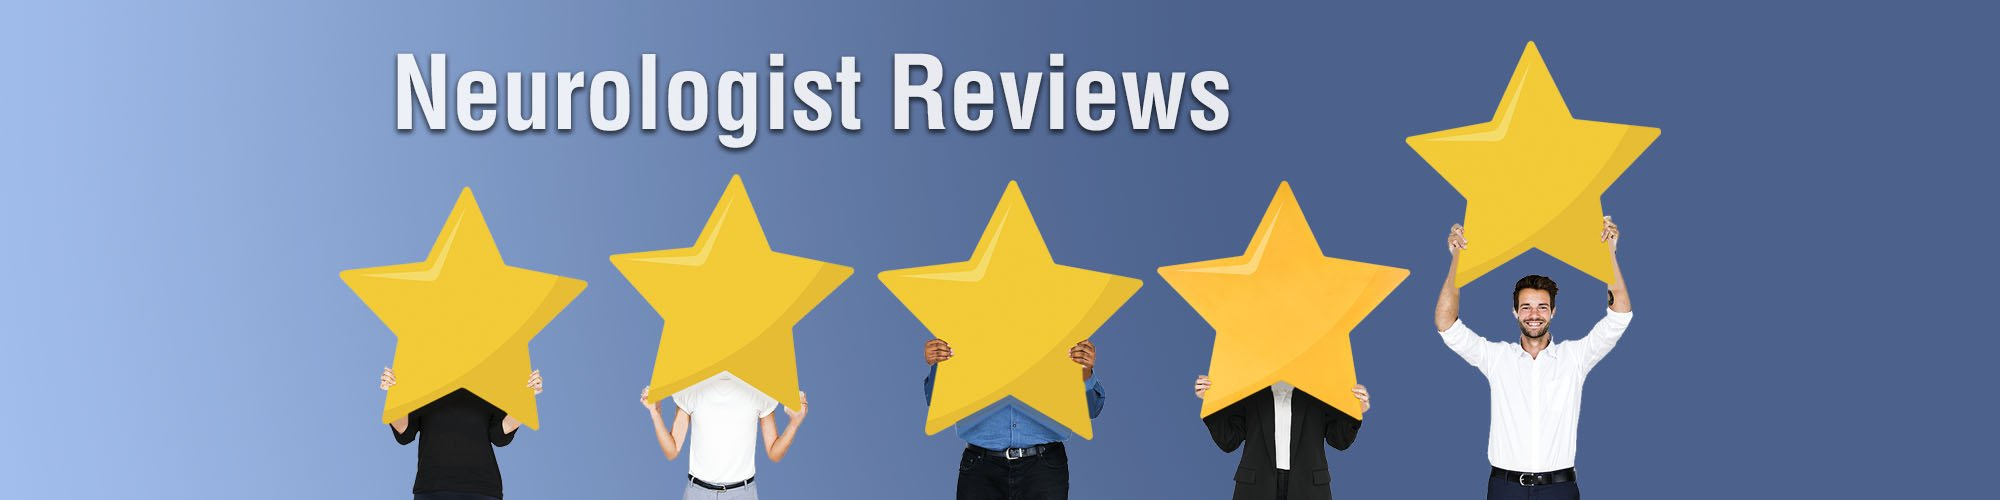 neurologist reviews image